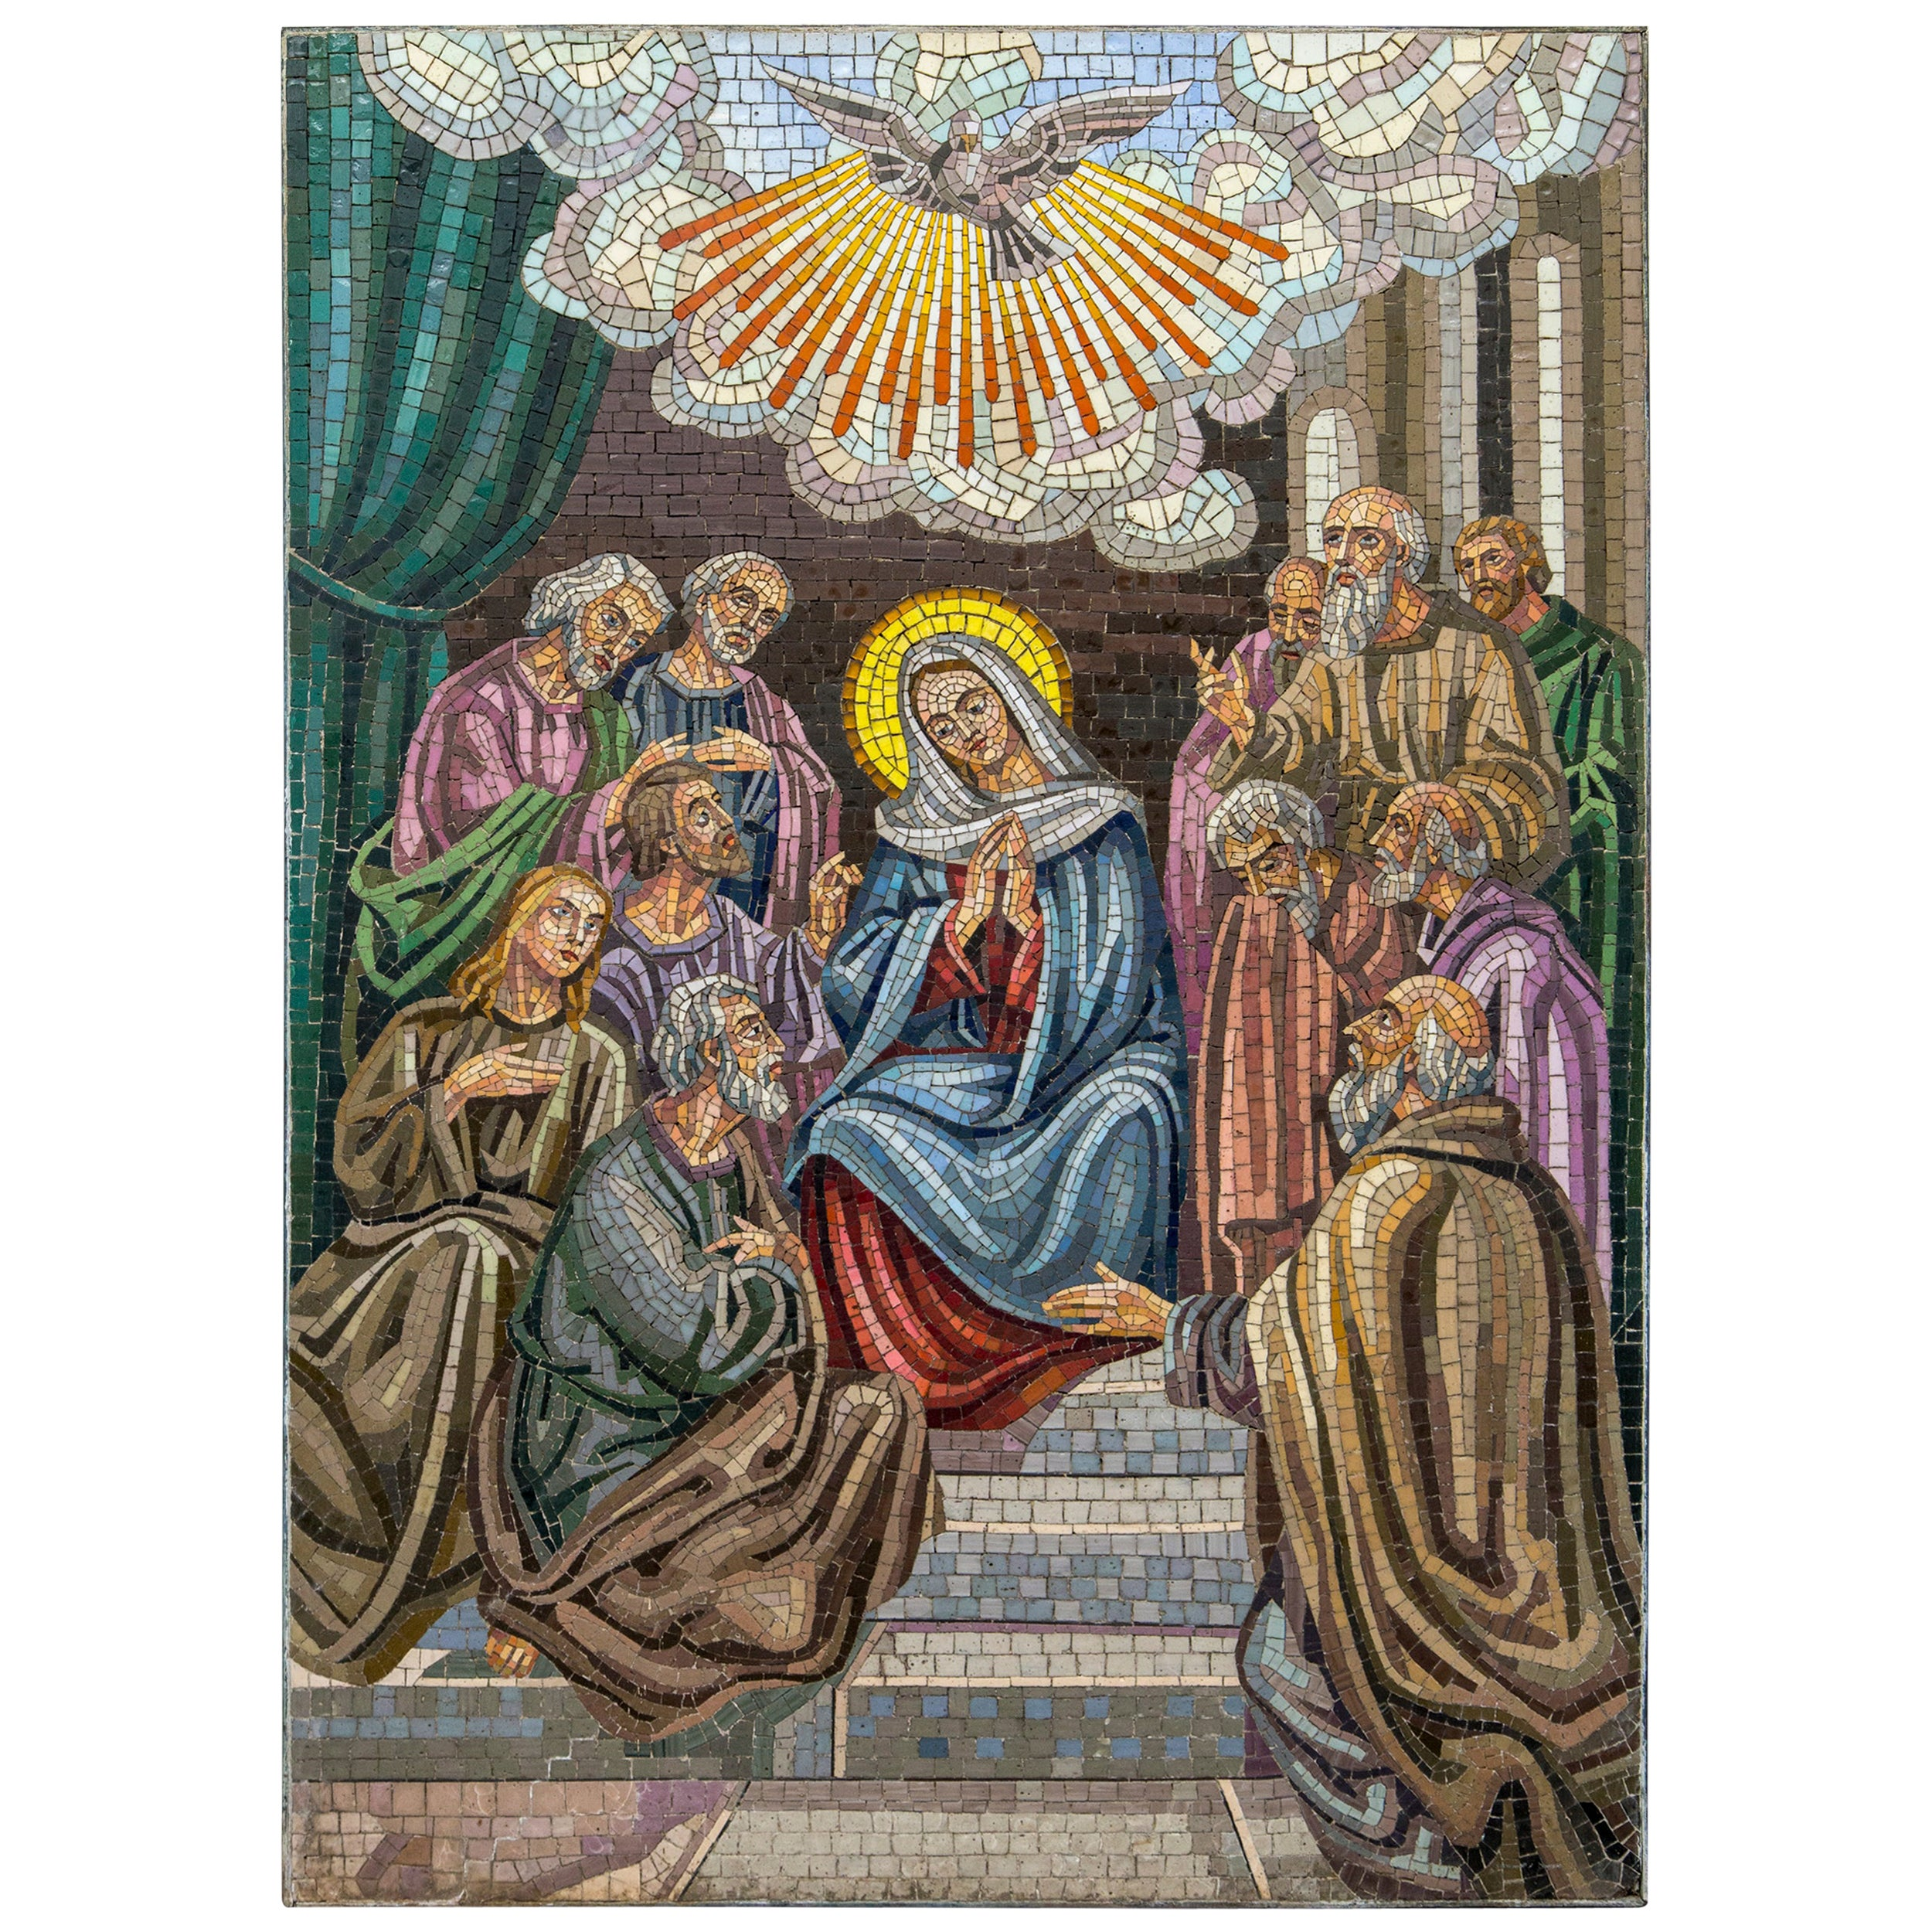 Mosaic of the Virgin and Apostles